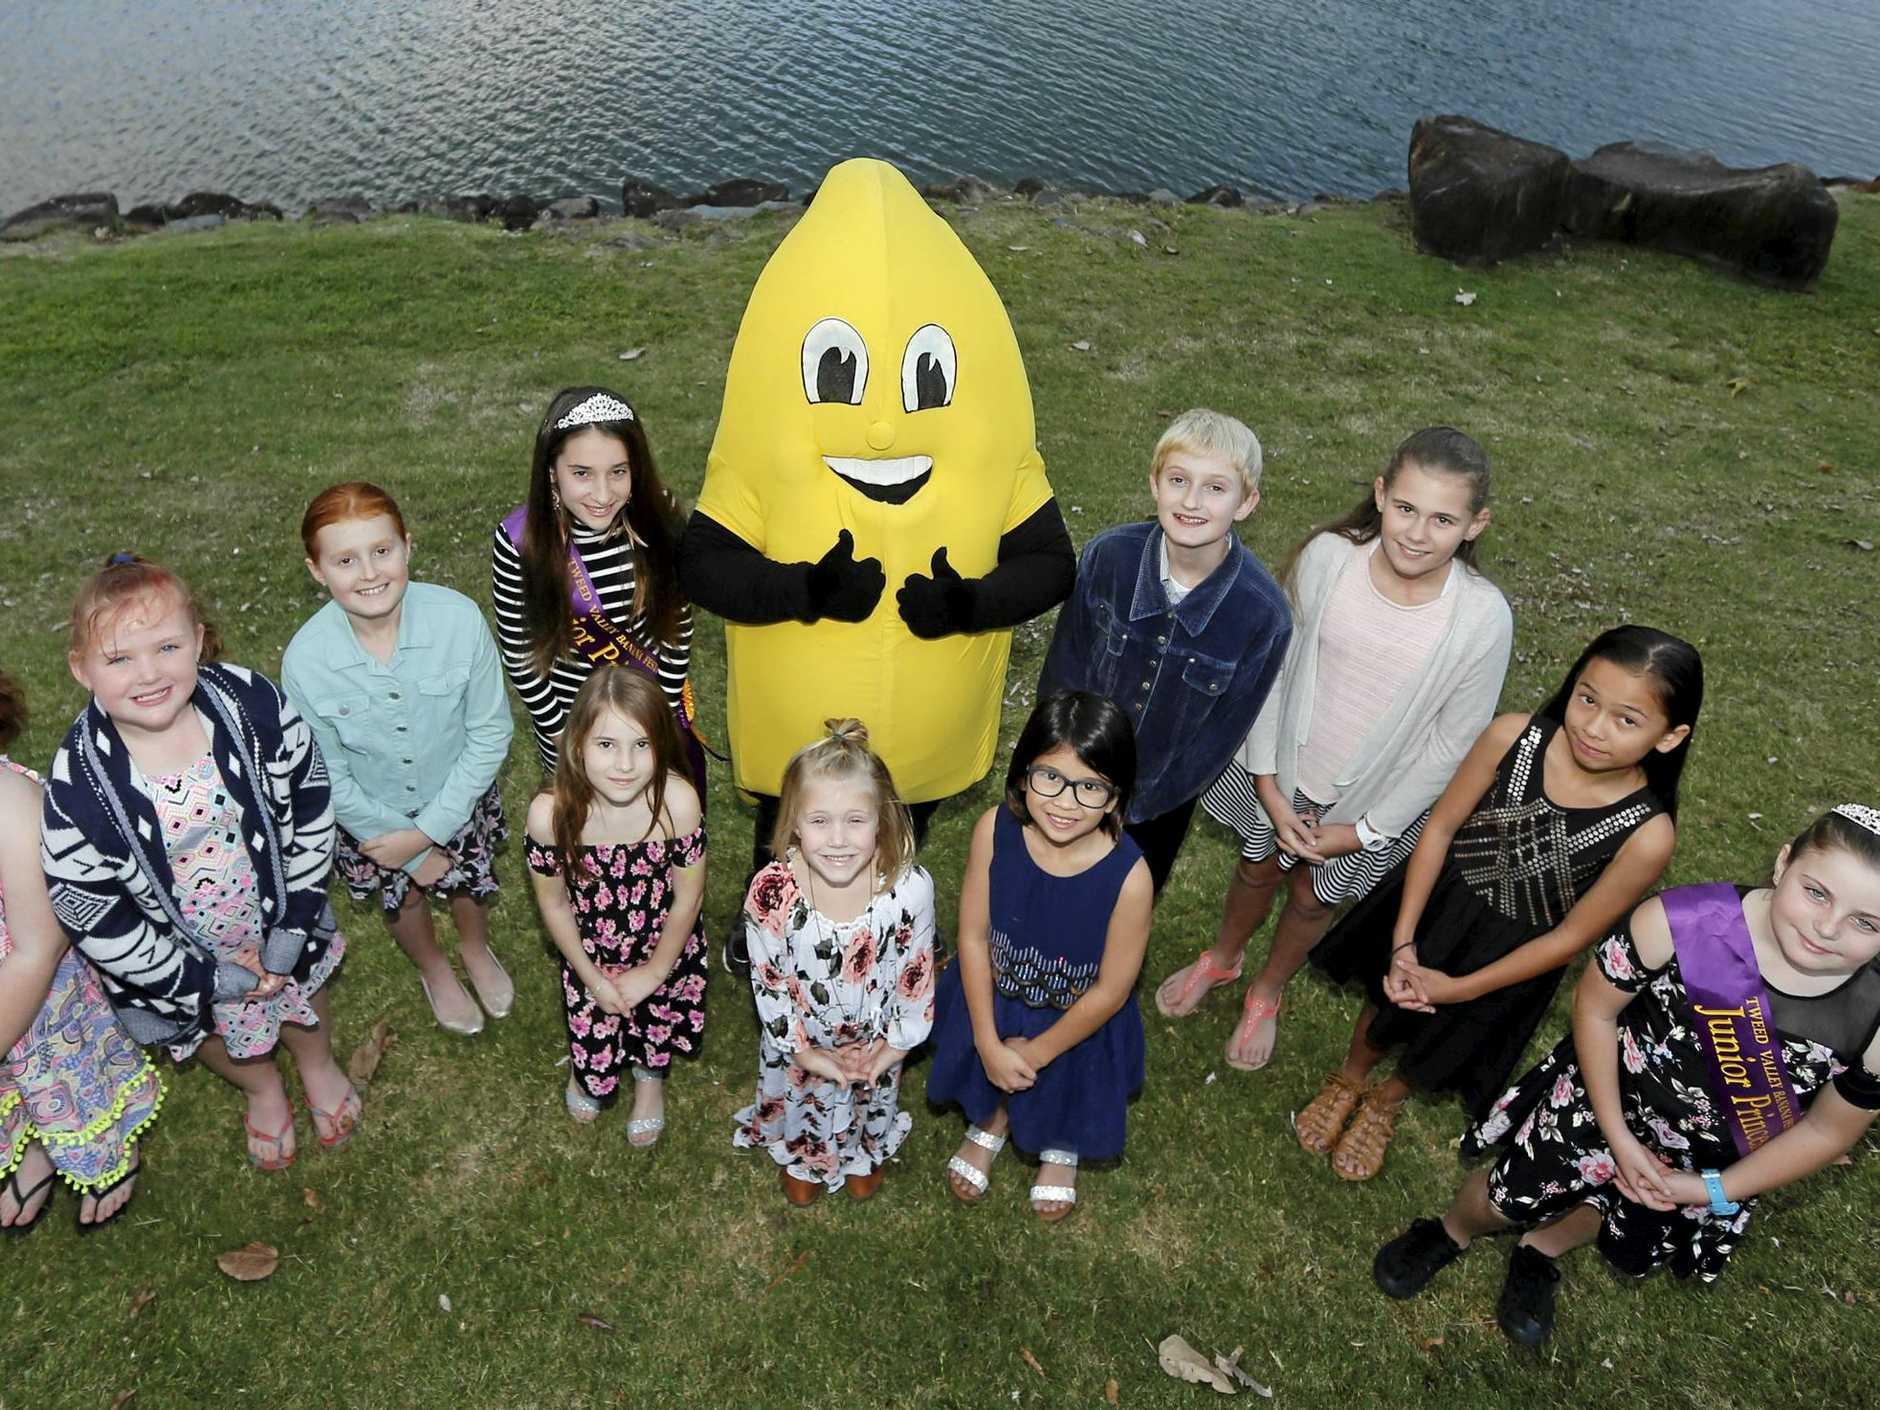 Banana Festival 2018 Junior Princess and Senior Princess contestants get ready for the coming judging sessions.